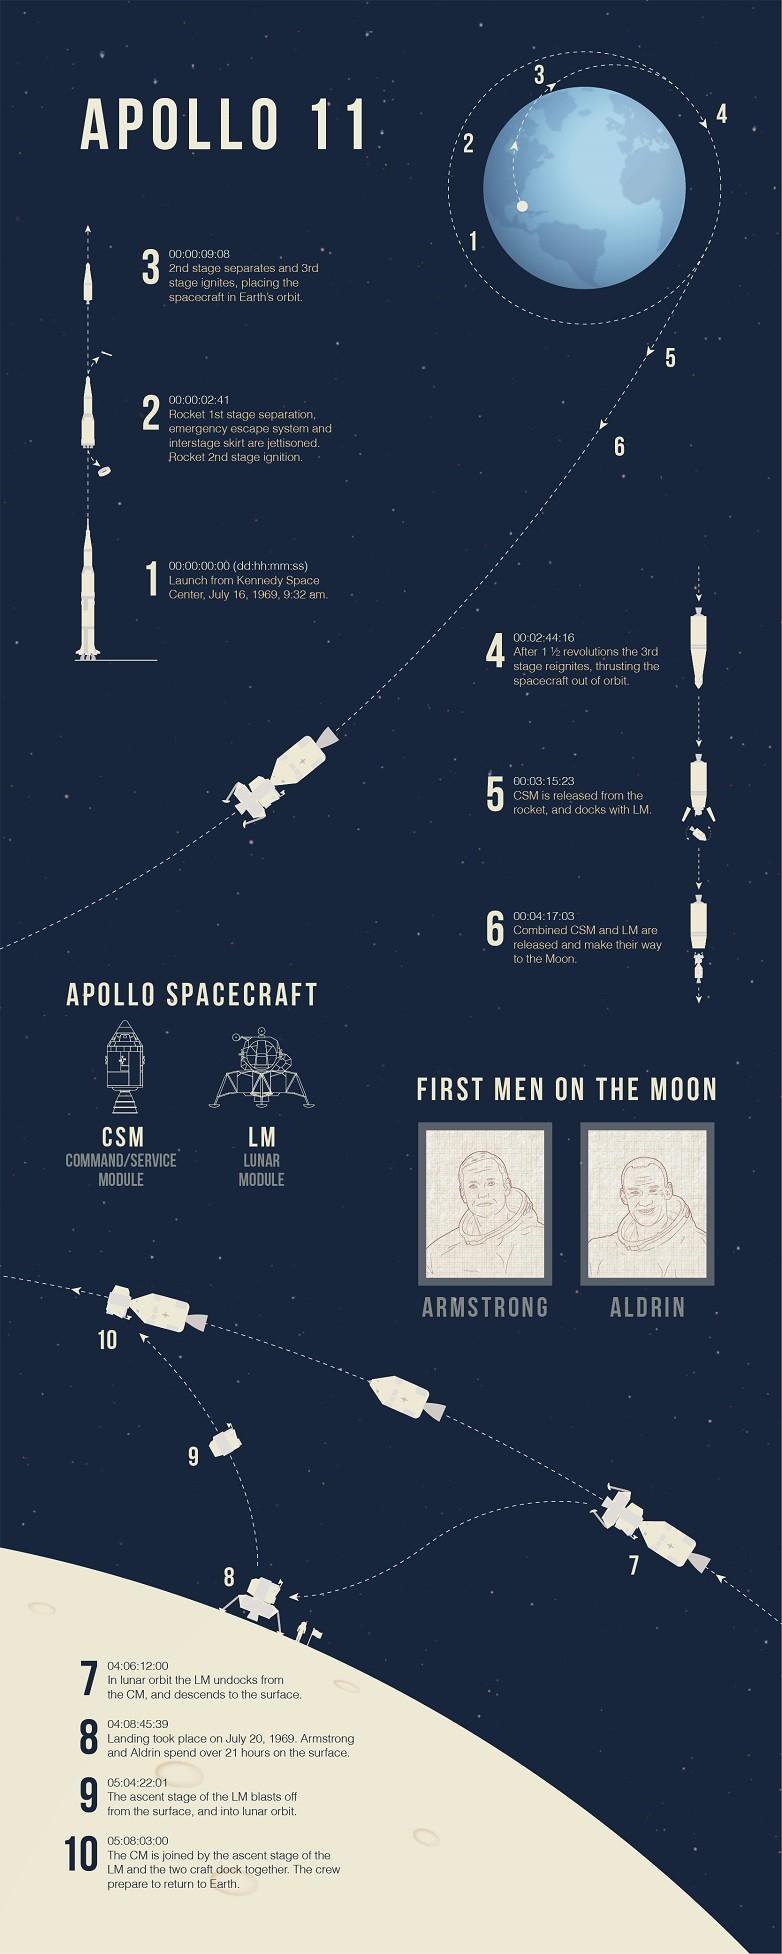 apollo 11 space mission facts - photo #37